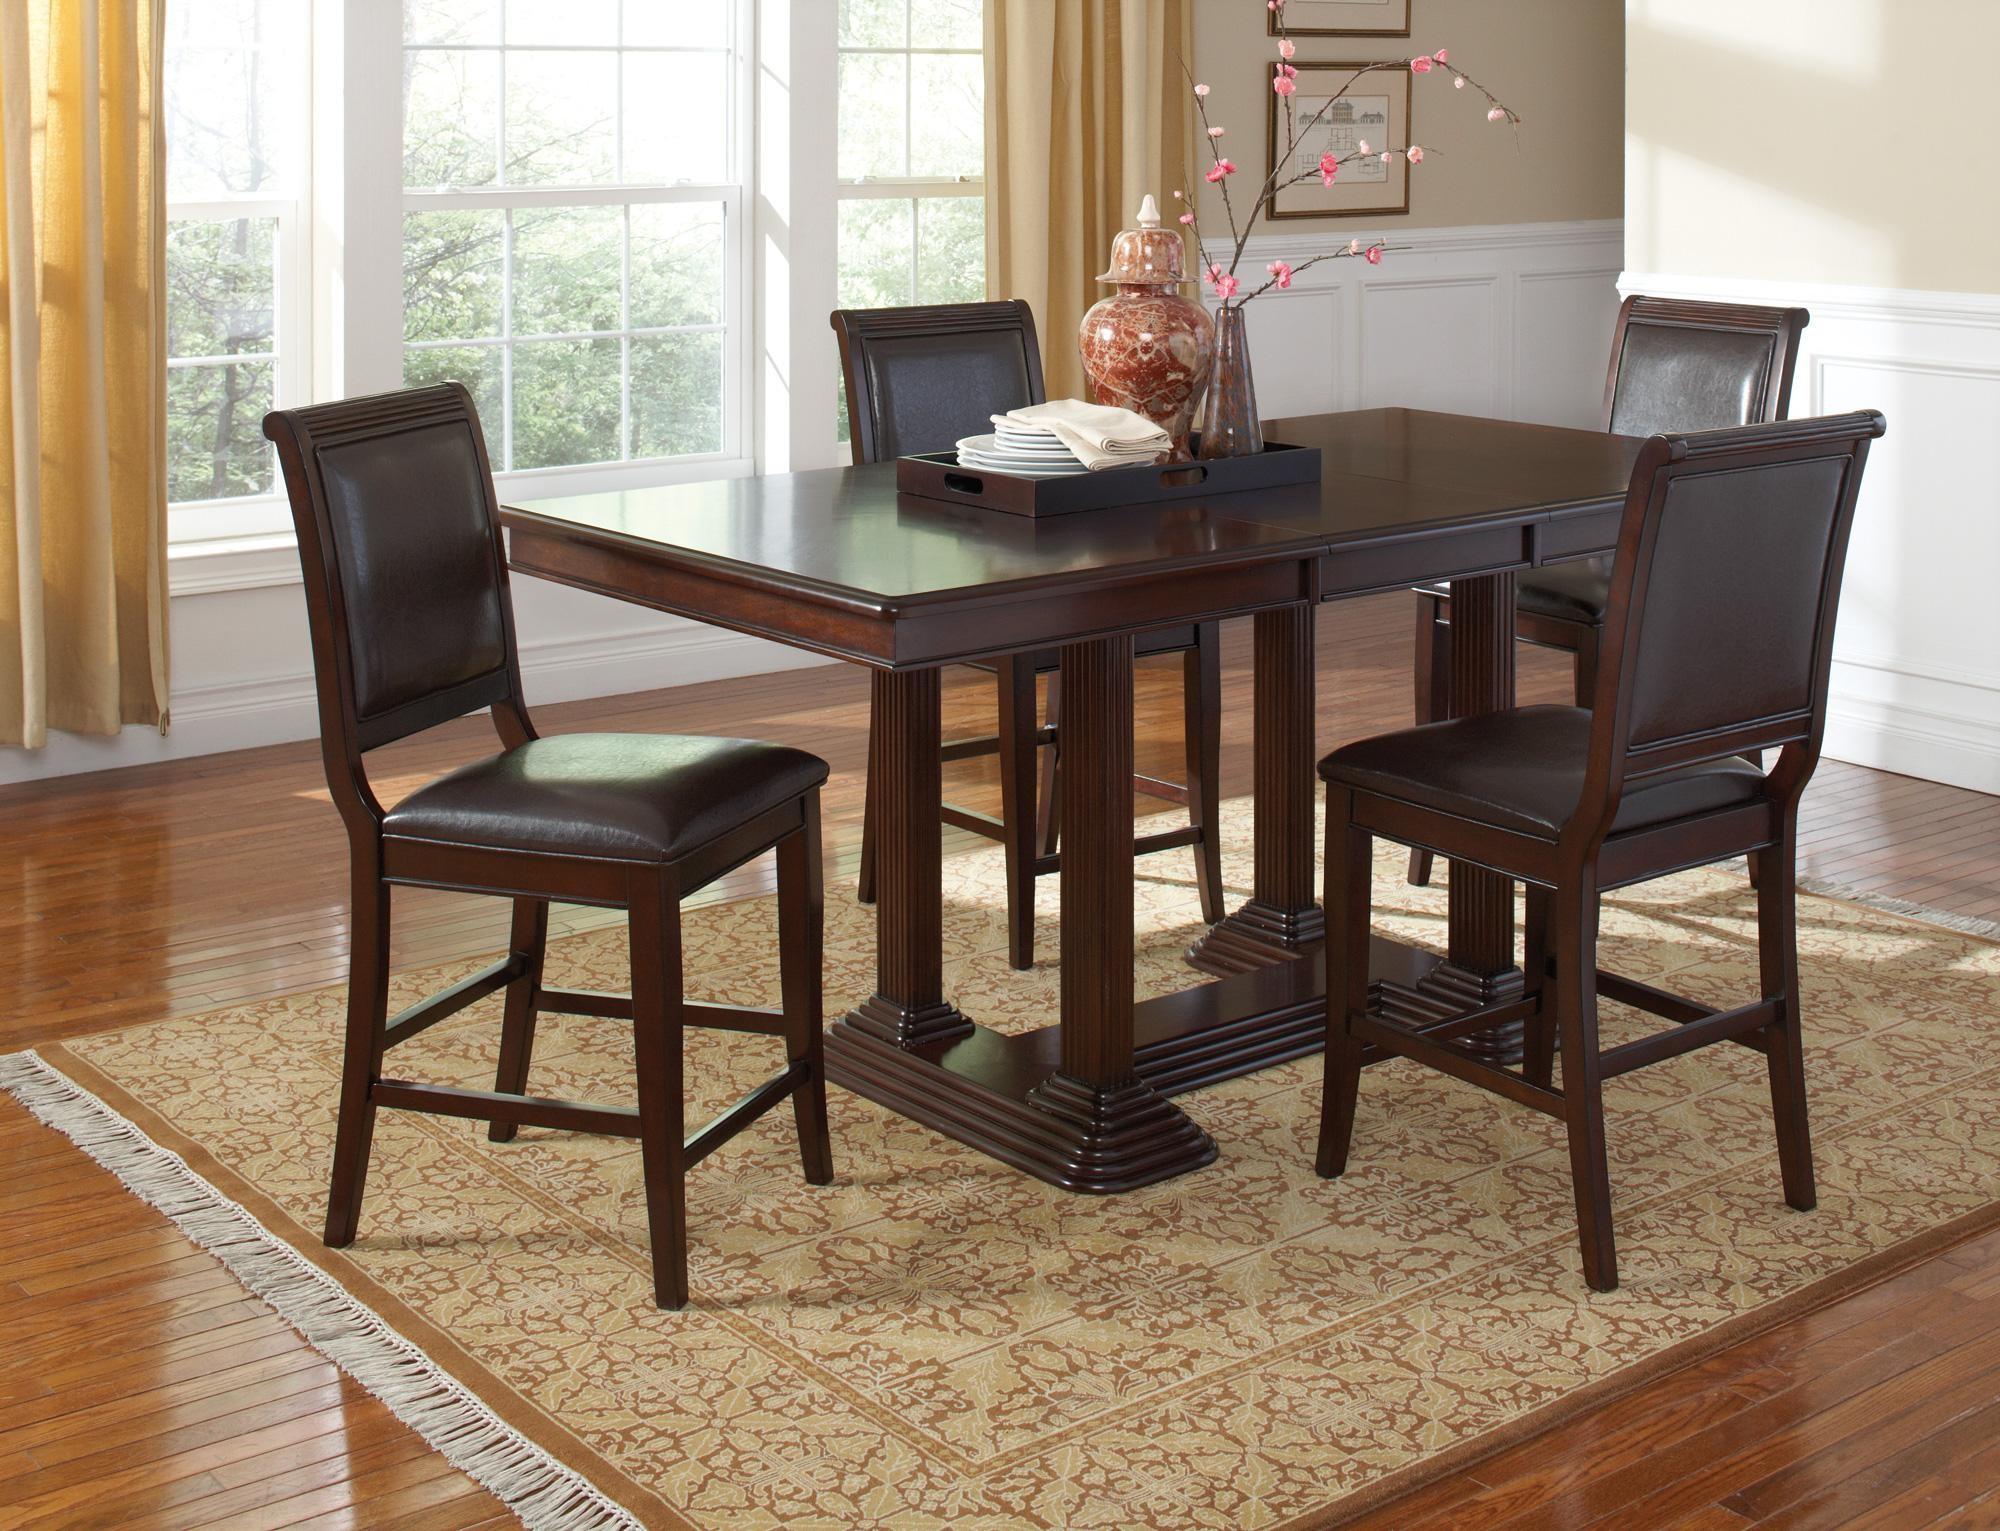 Counter Height Rectangular Dining Set : Sullivan Rectangular Counter Height Dining Room Set, 101978, Coaster ...